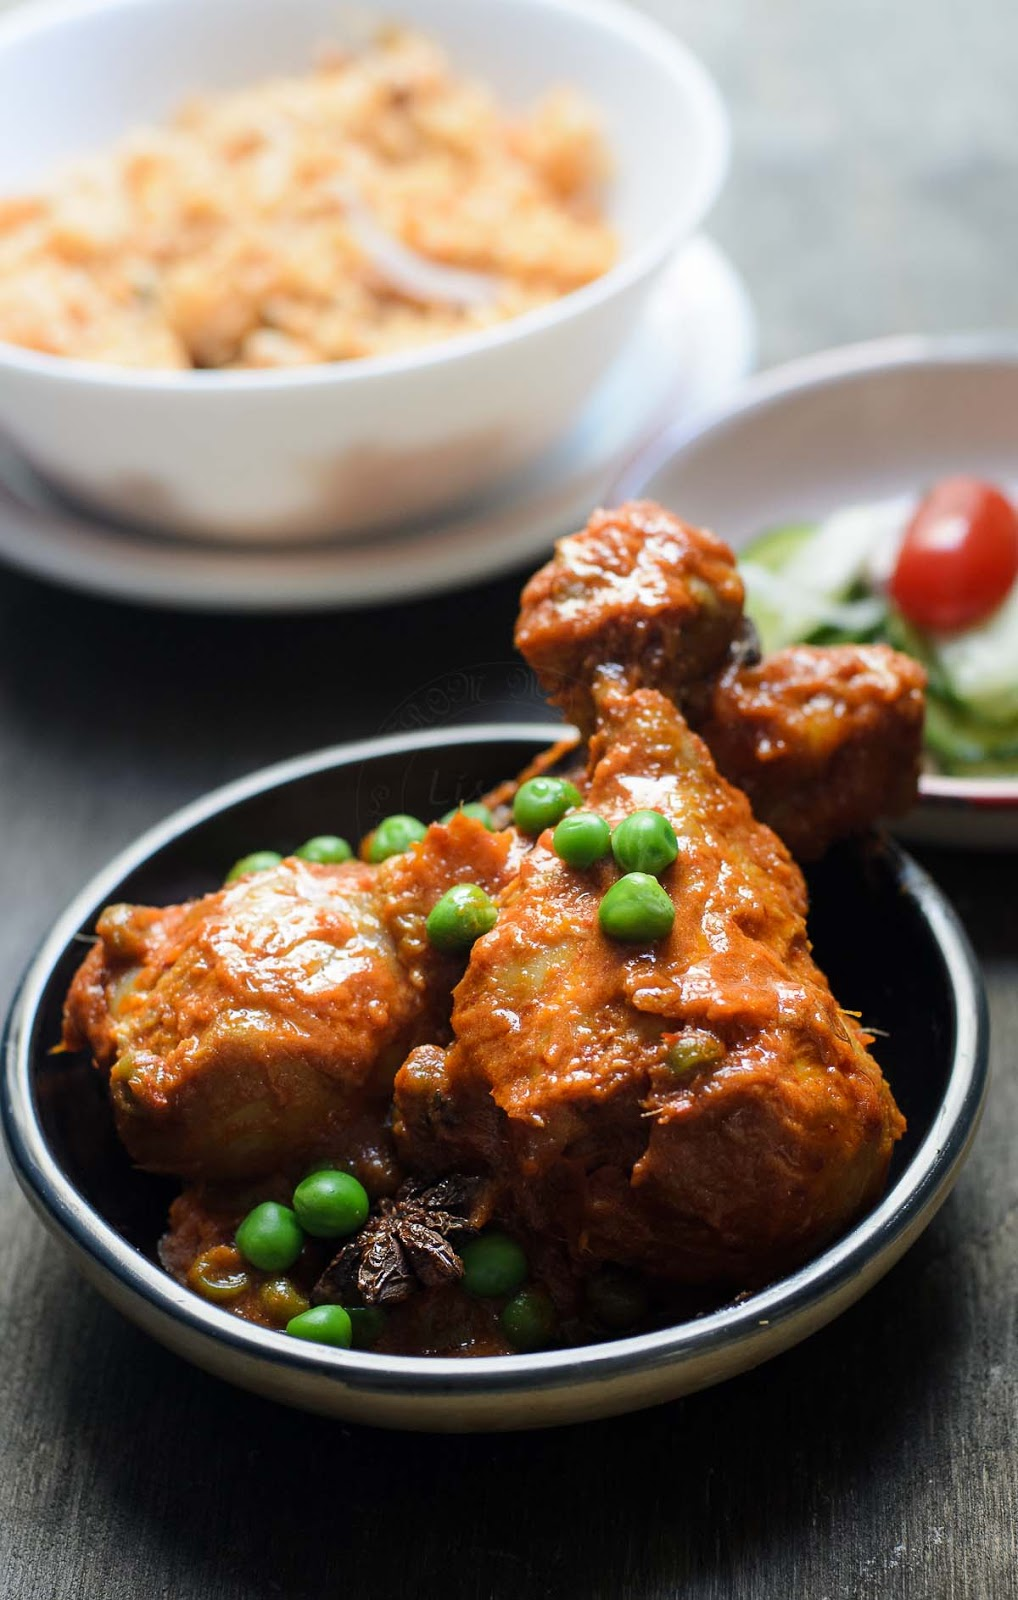 Ayam masak merah photo